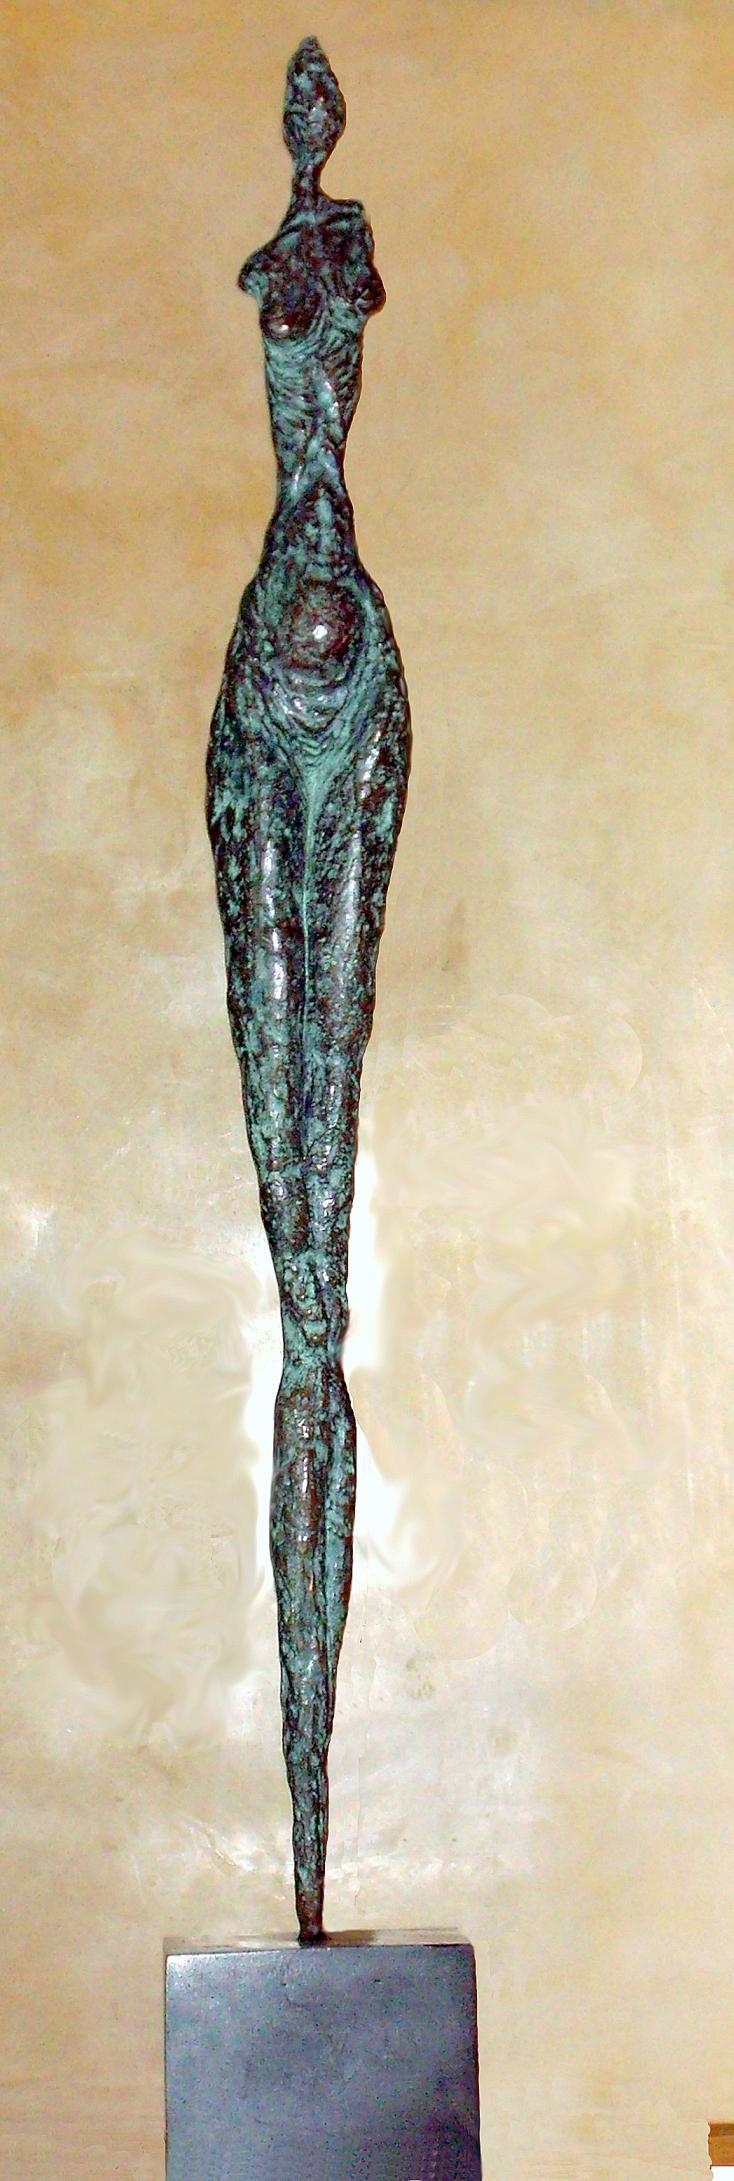 Venus de bronce